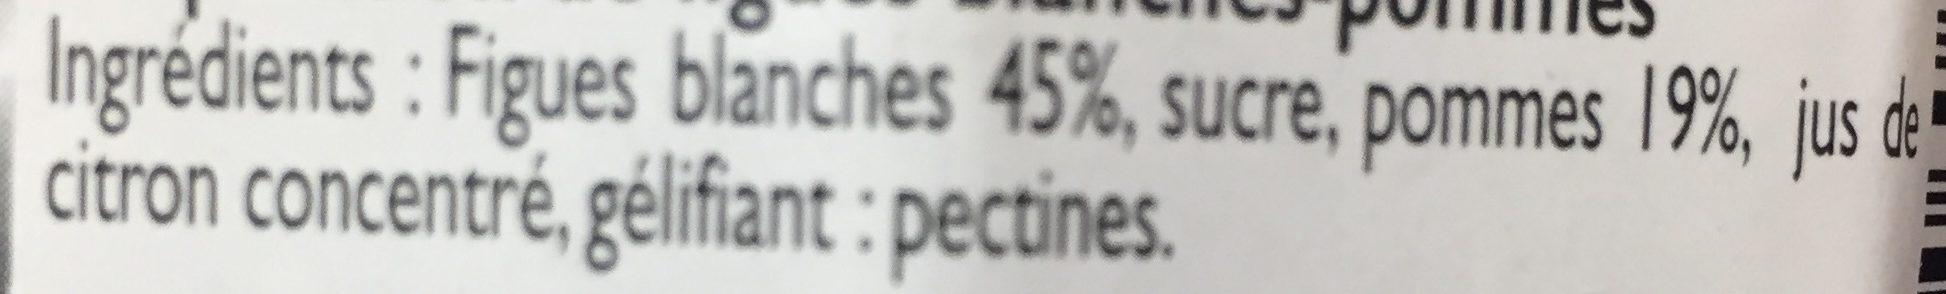 Confiture Figue Blanche - Ingredients